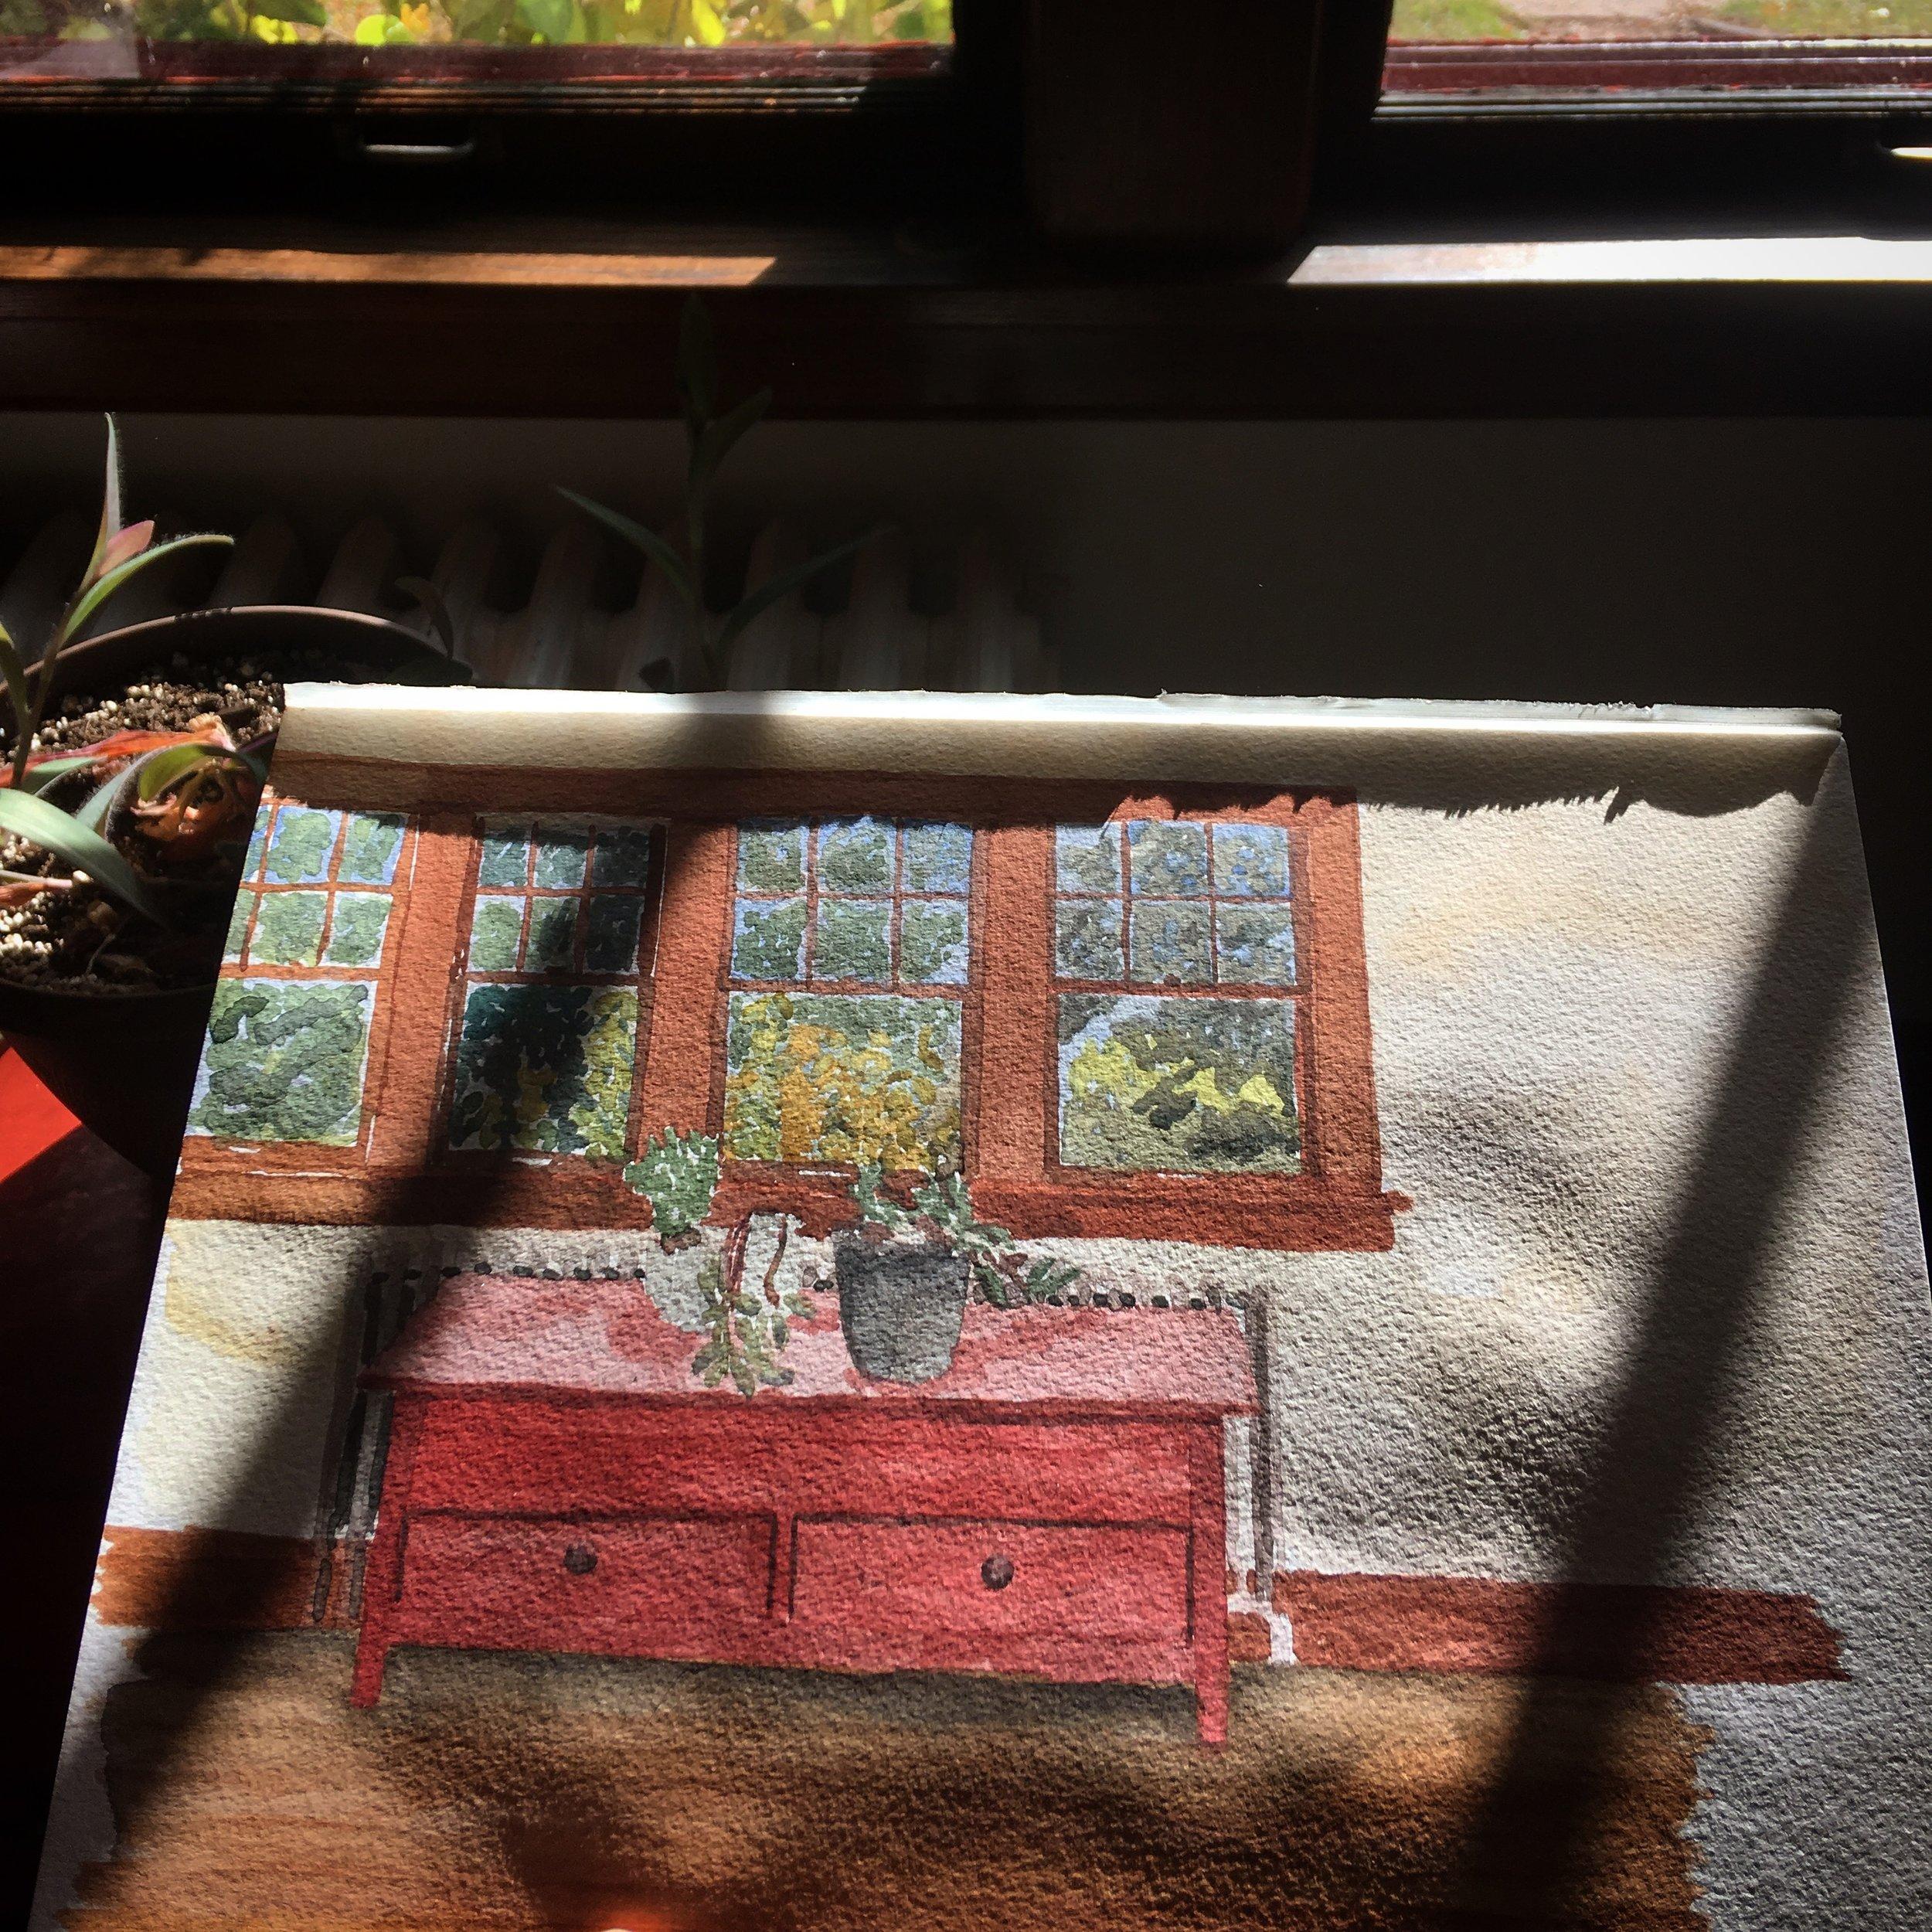 Michele's front window